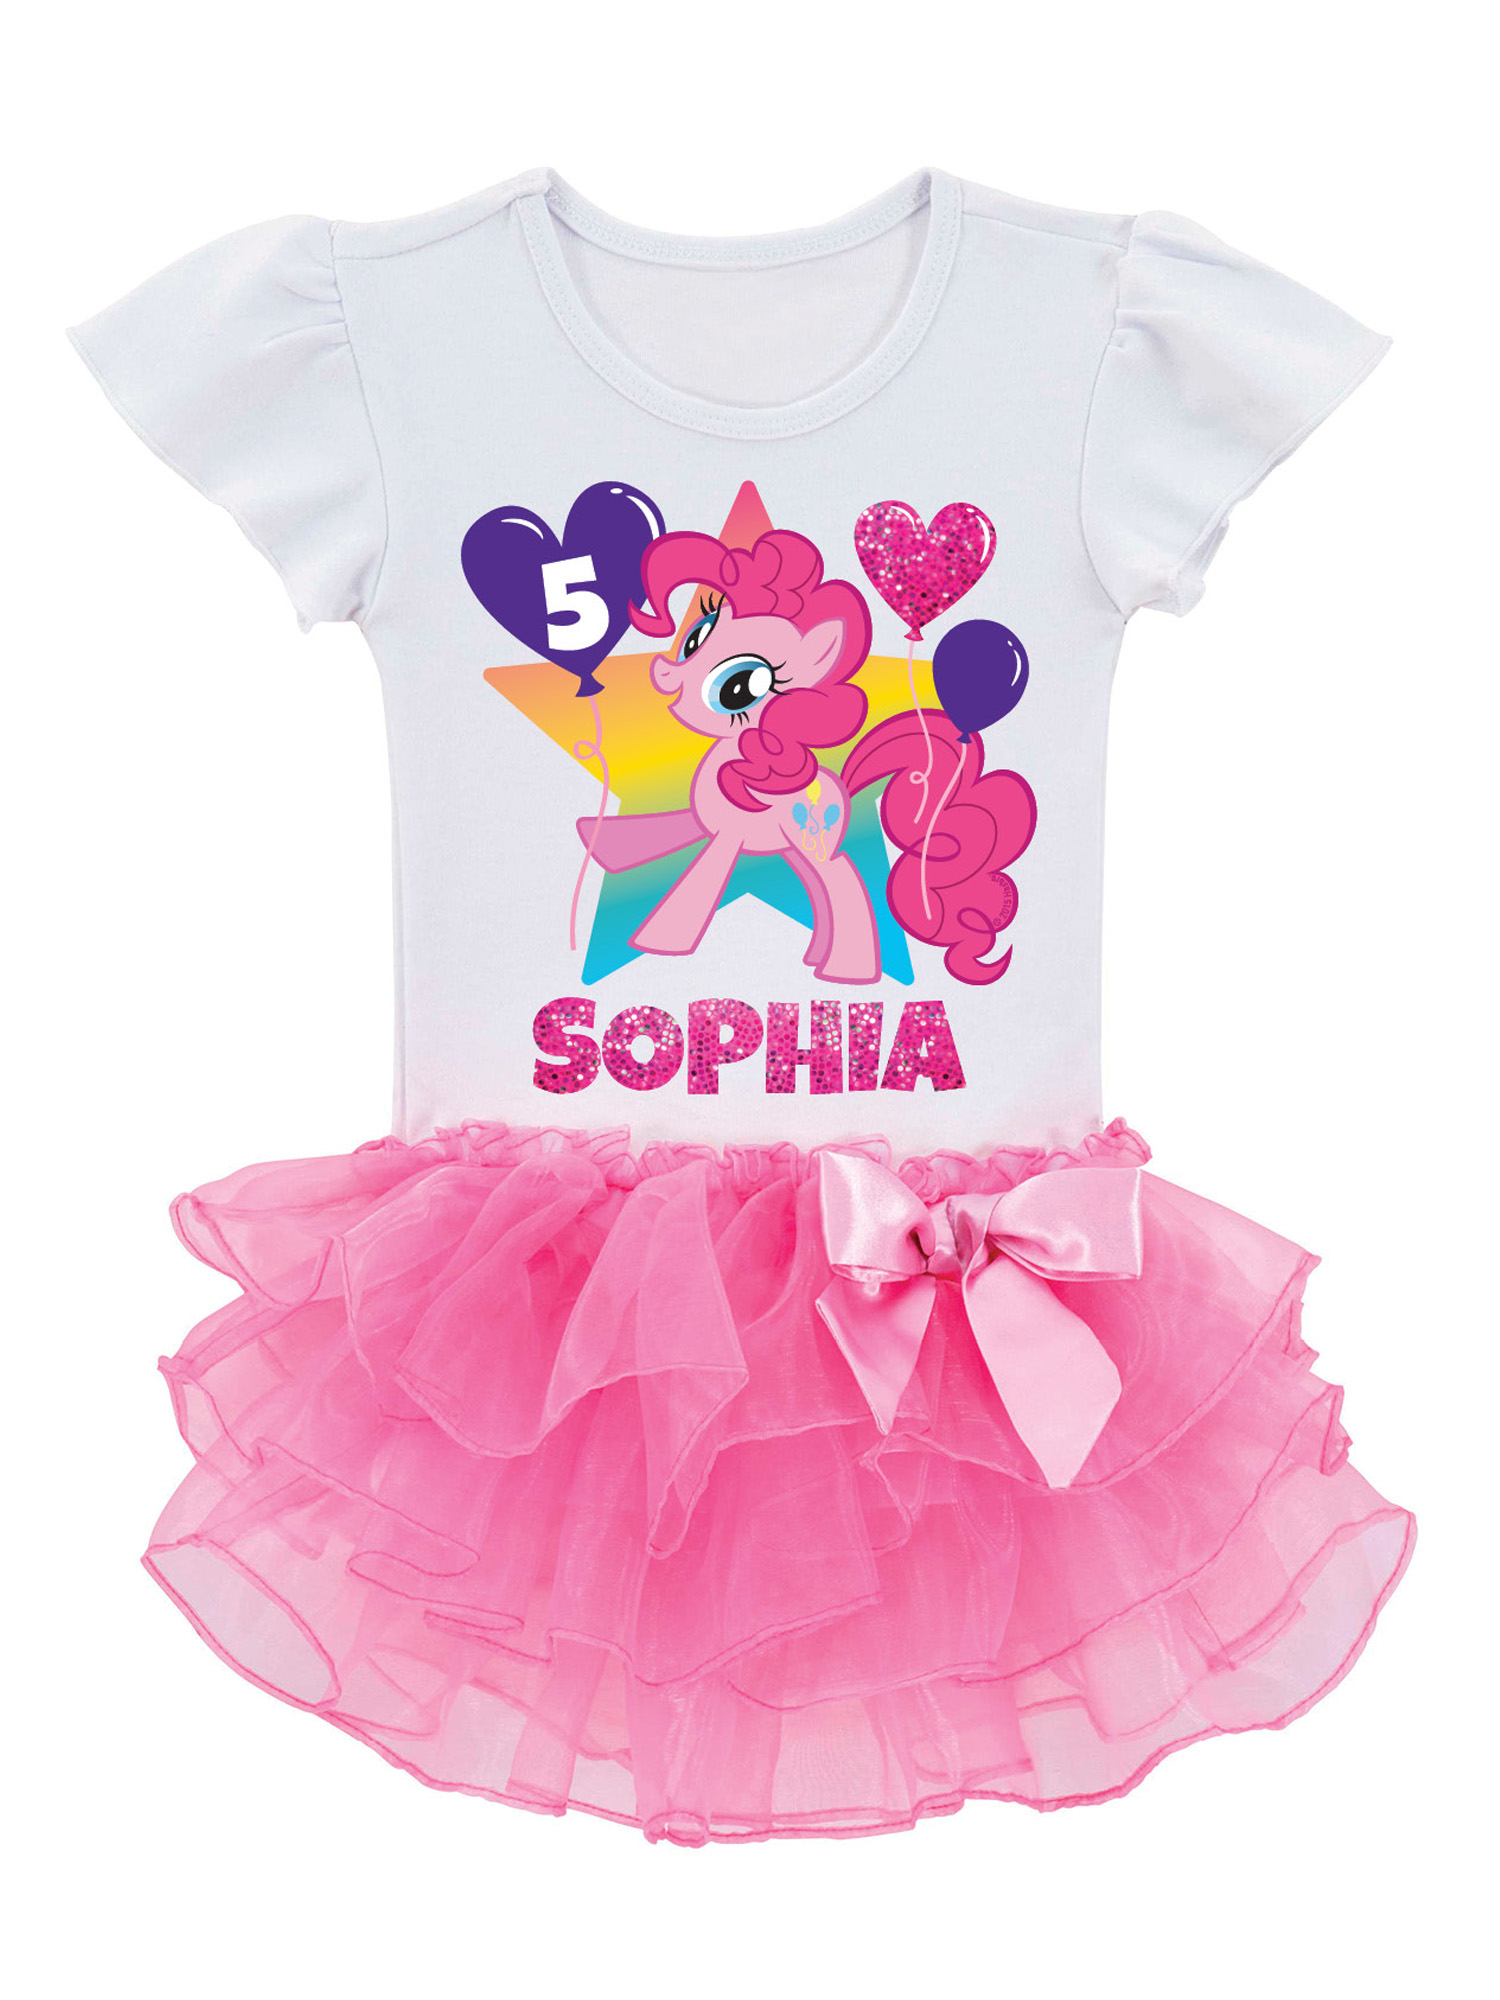 Personalized My Little Pony Pinkie Pie Birthday Toddler Girls' Tutu T-Shirt